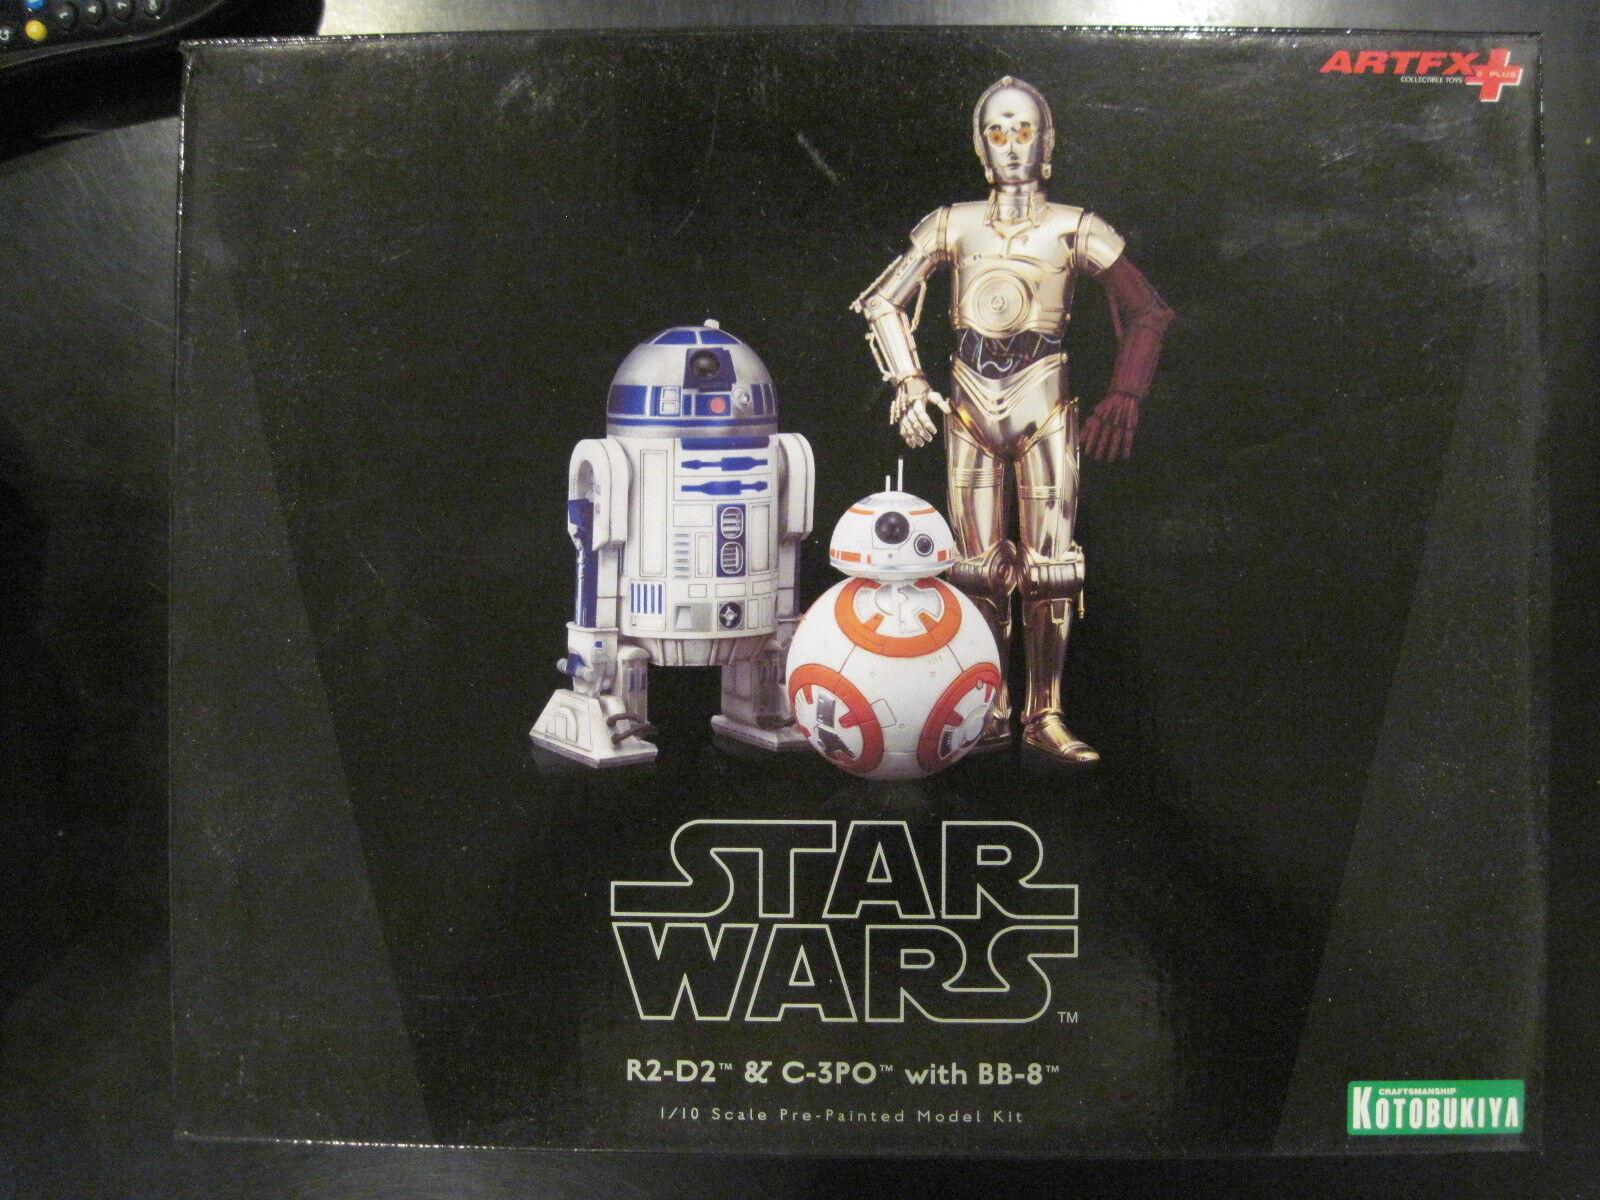 Kotobukiya ArtFX Star Wars R2-D2 & C-3PO with BB-8 1/10 Scale Pre-Painted Models